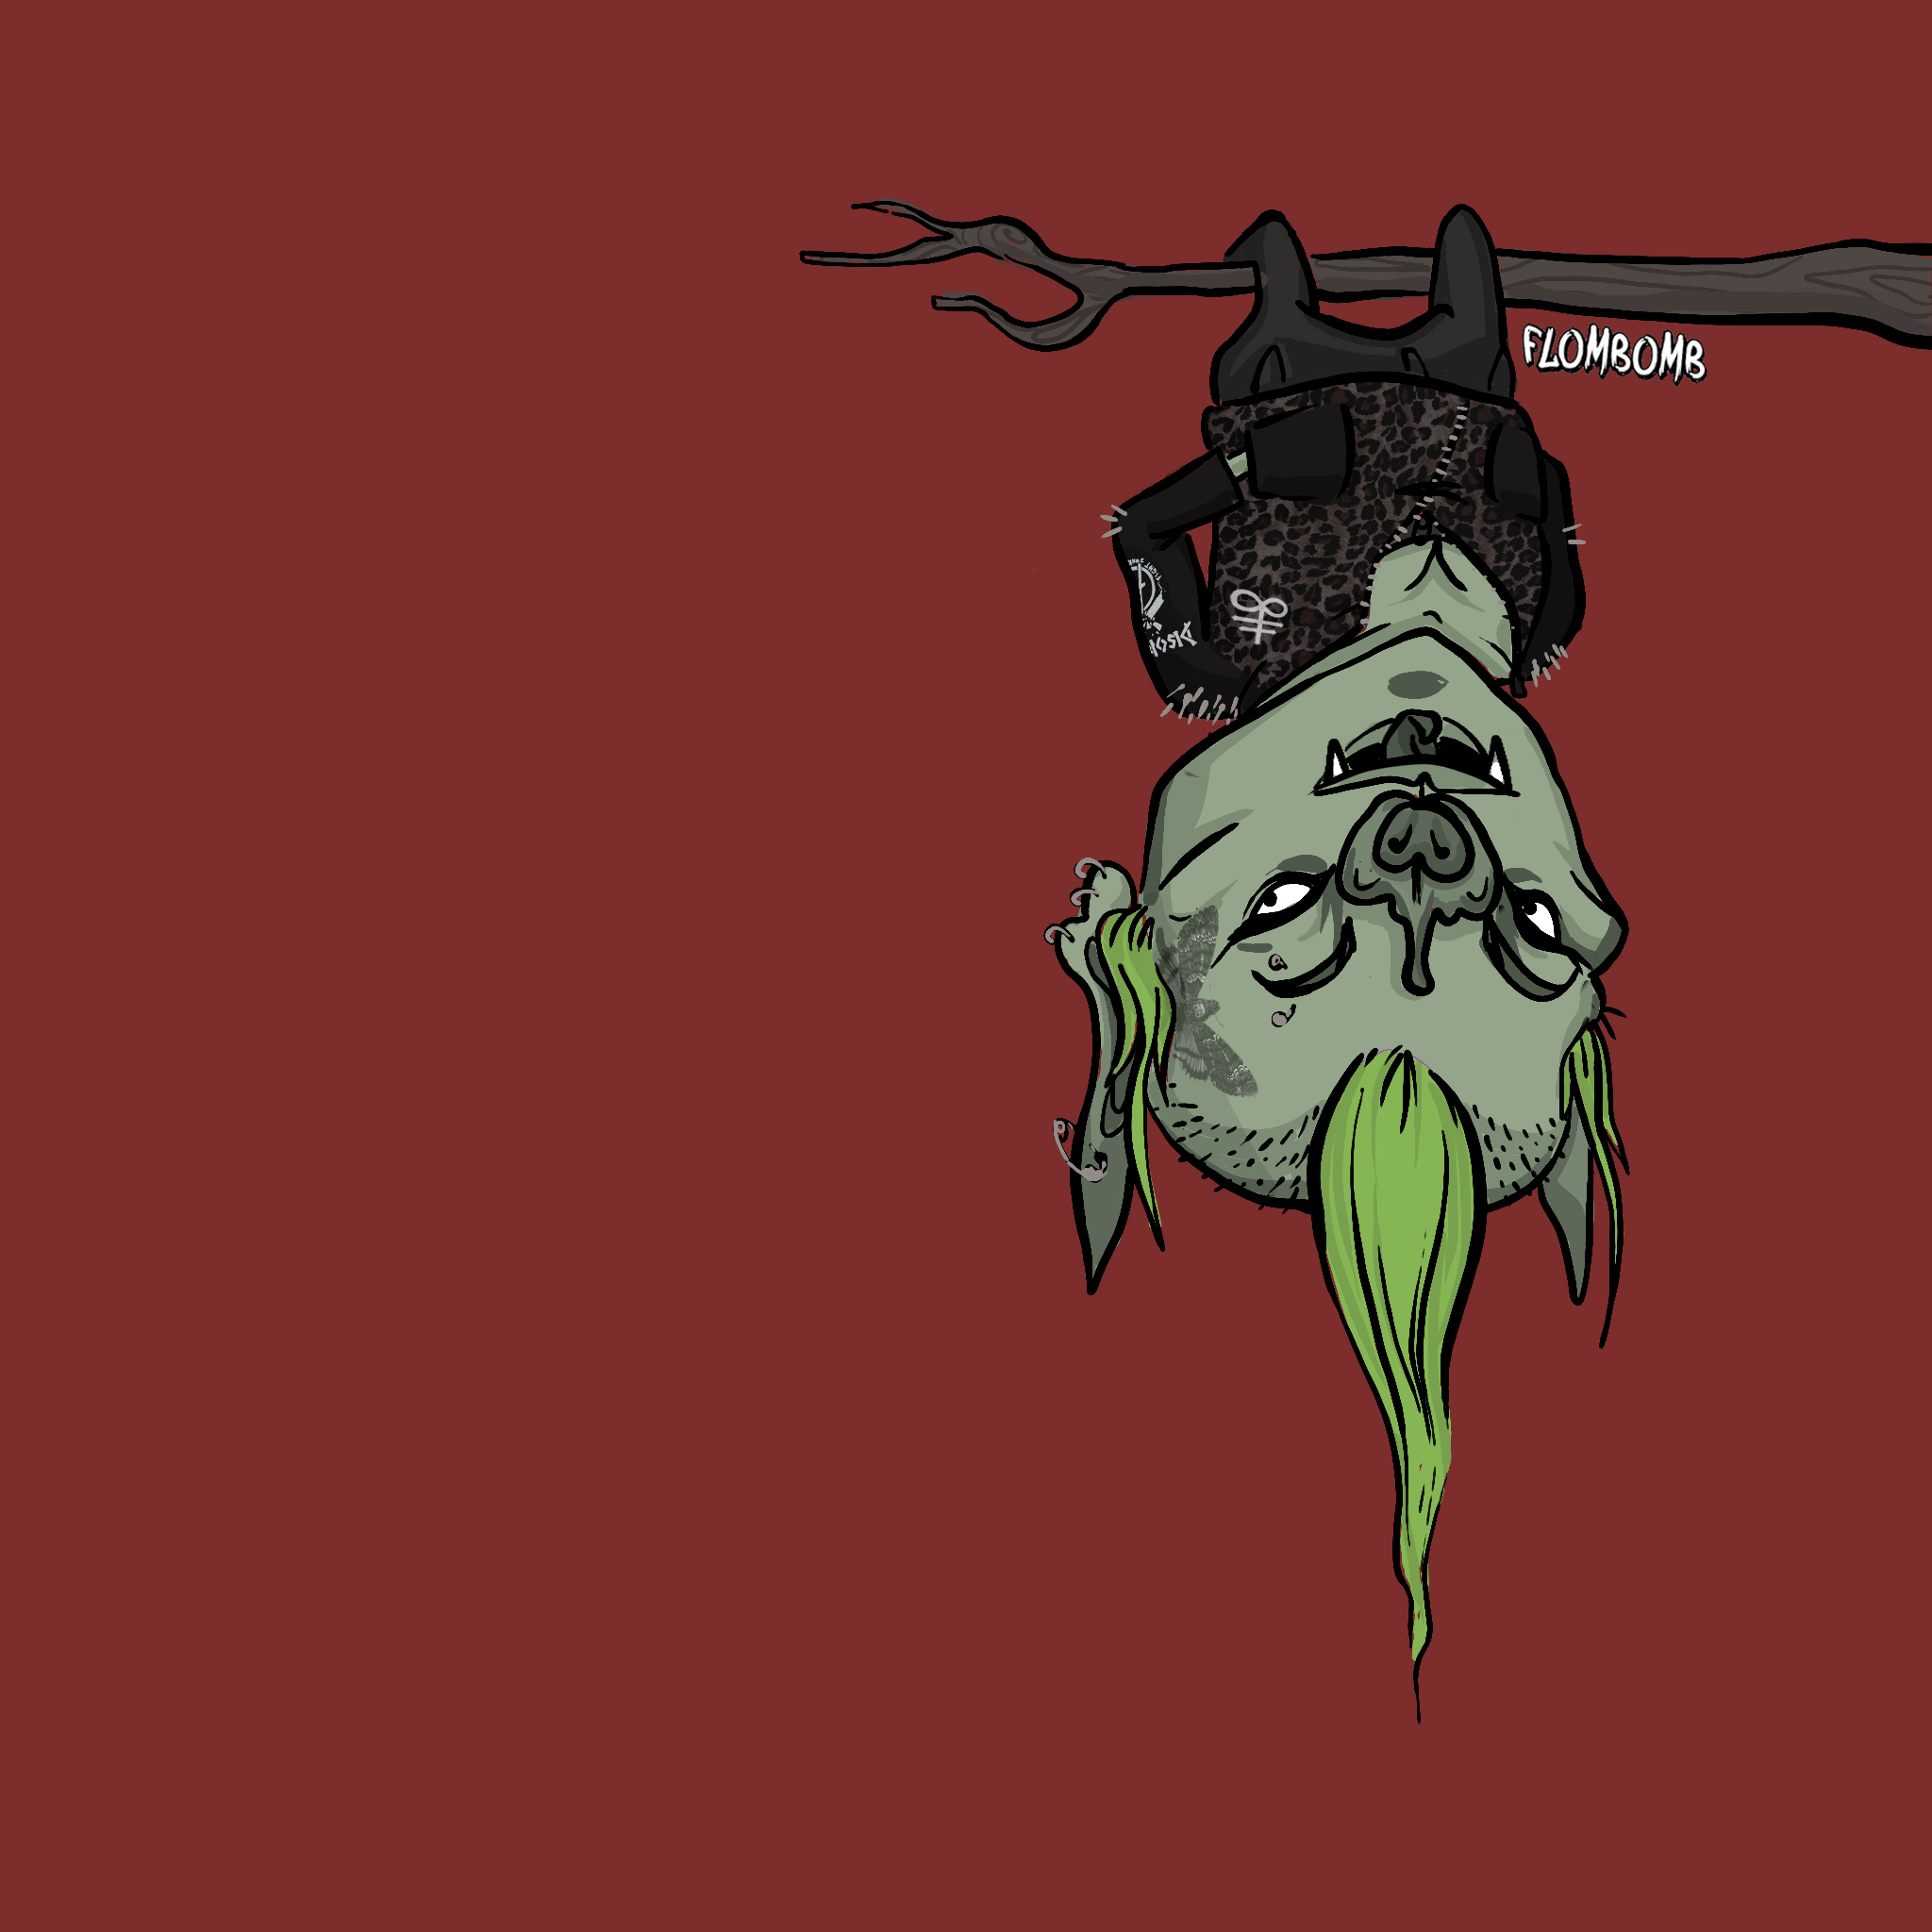 Vampirebat.jpg